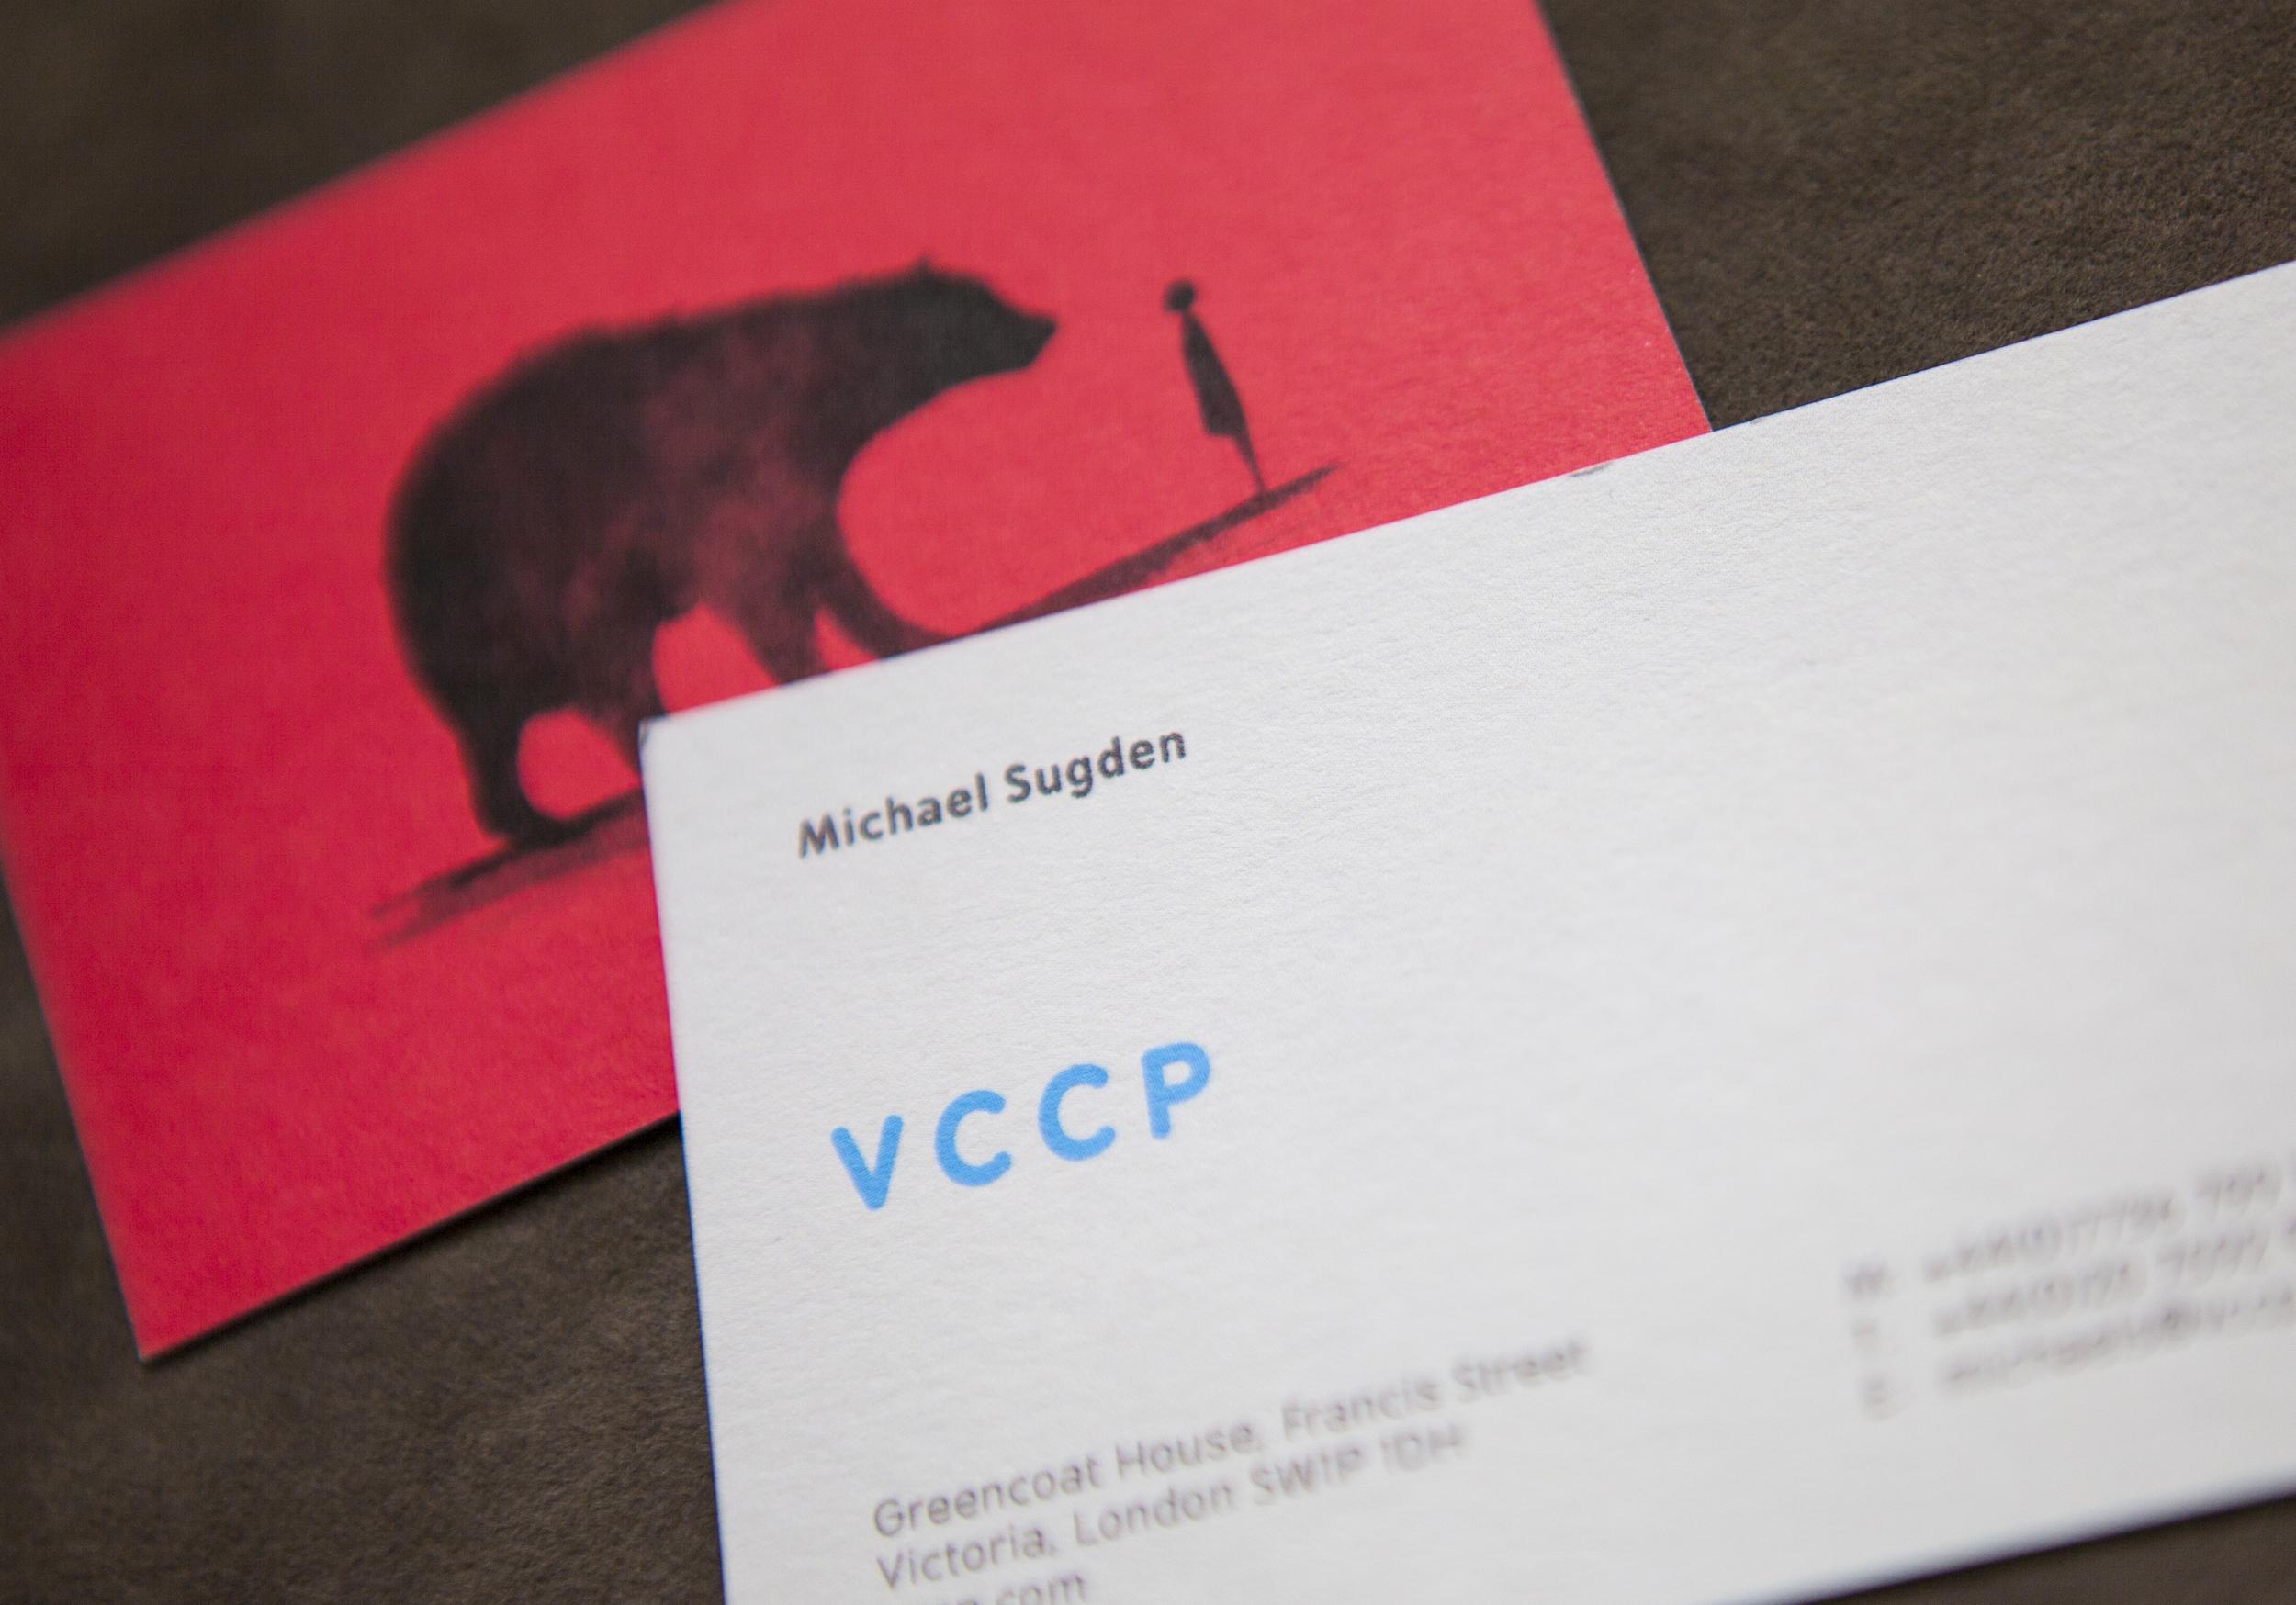 VCCP+cards+copy.jpg